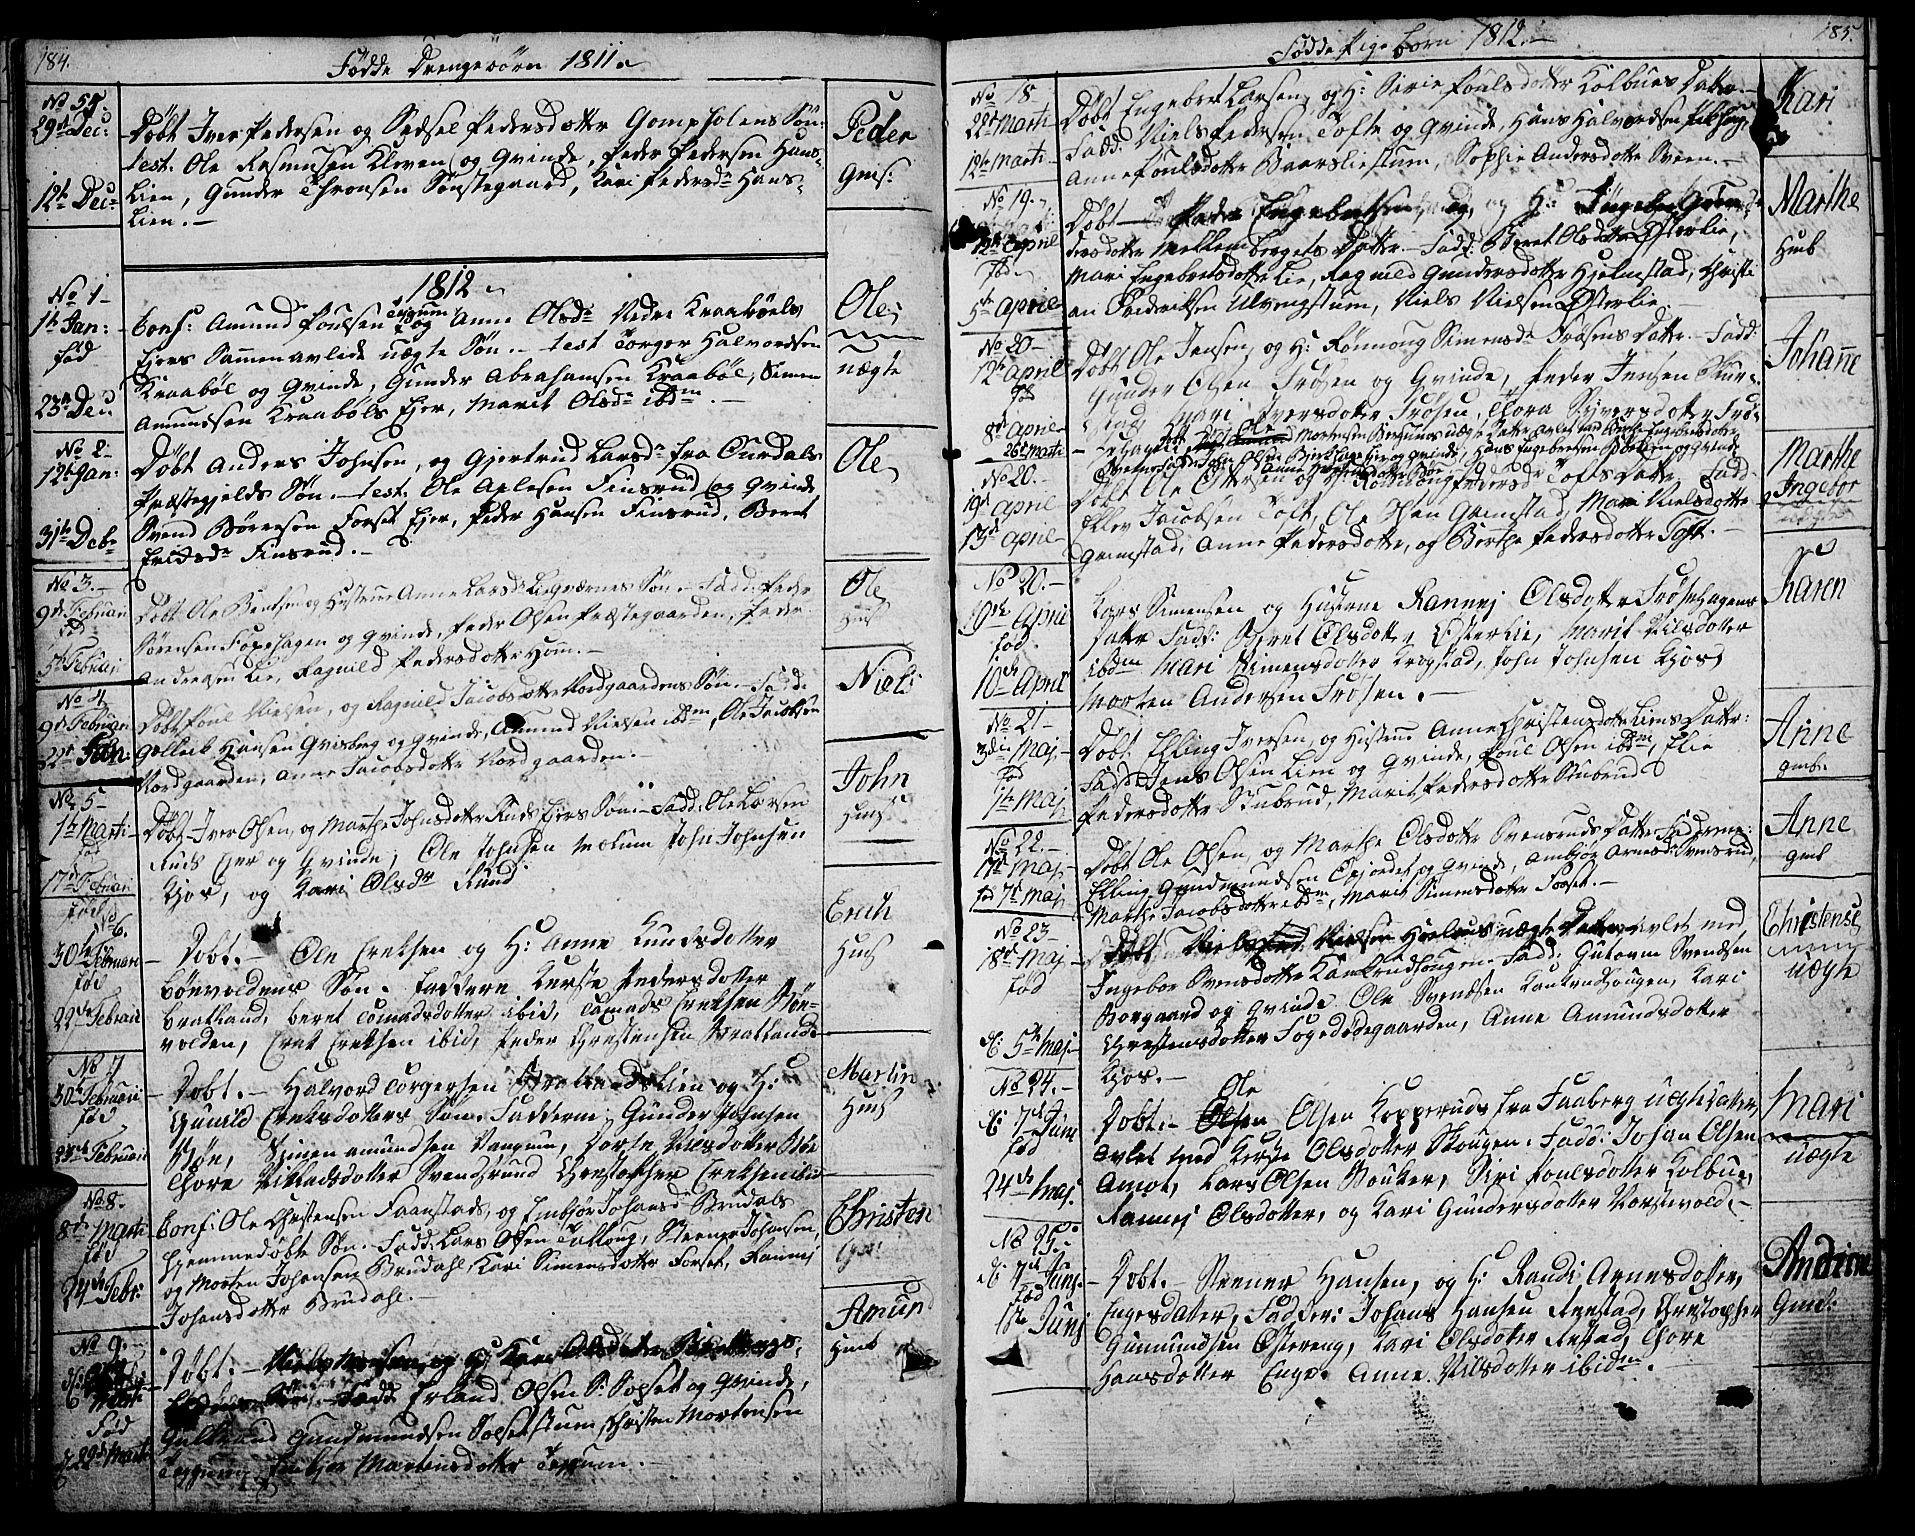 SAH, Gausdal prestekontor, Ministerialbok nr. 4, 1809-1817, s. 184-185